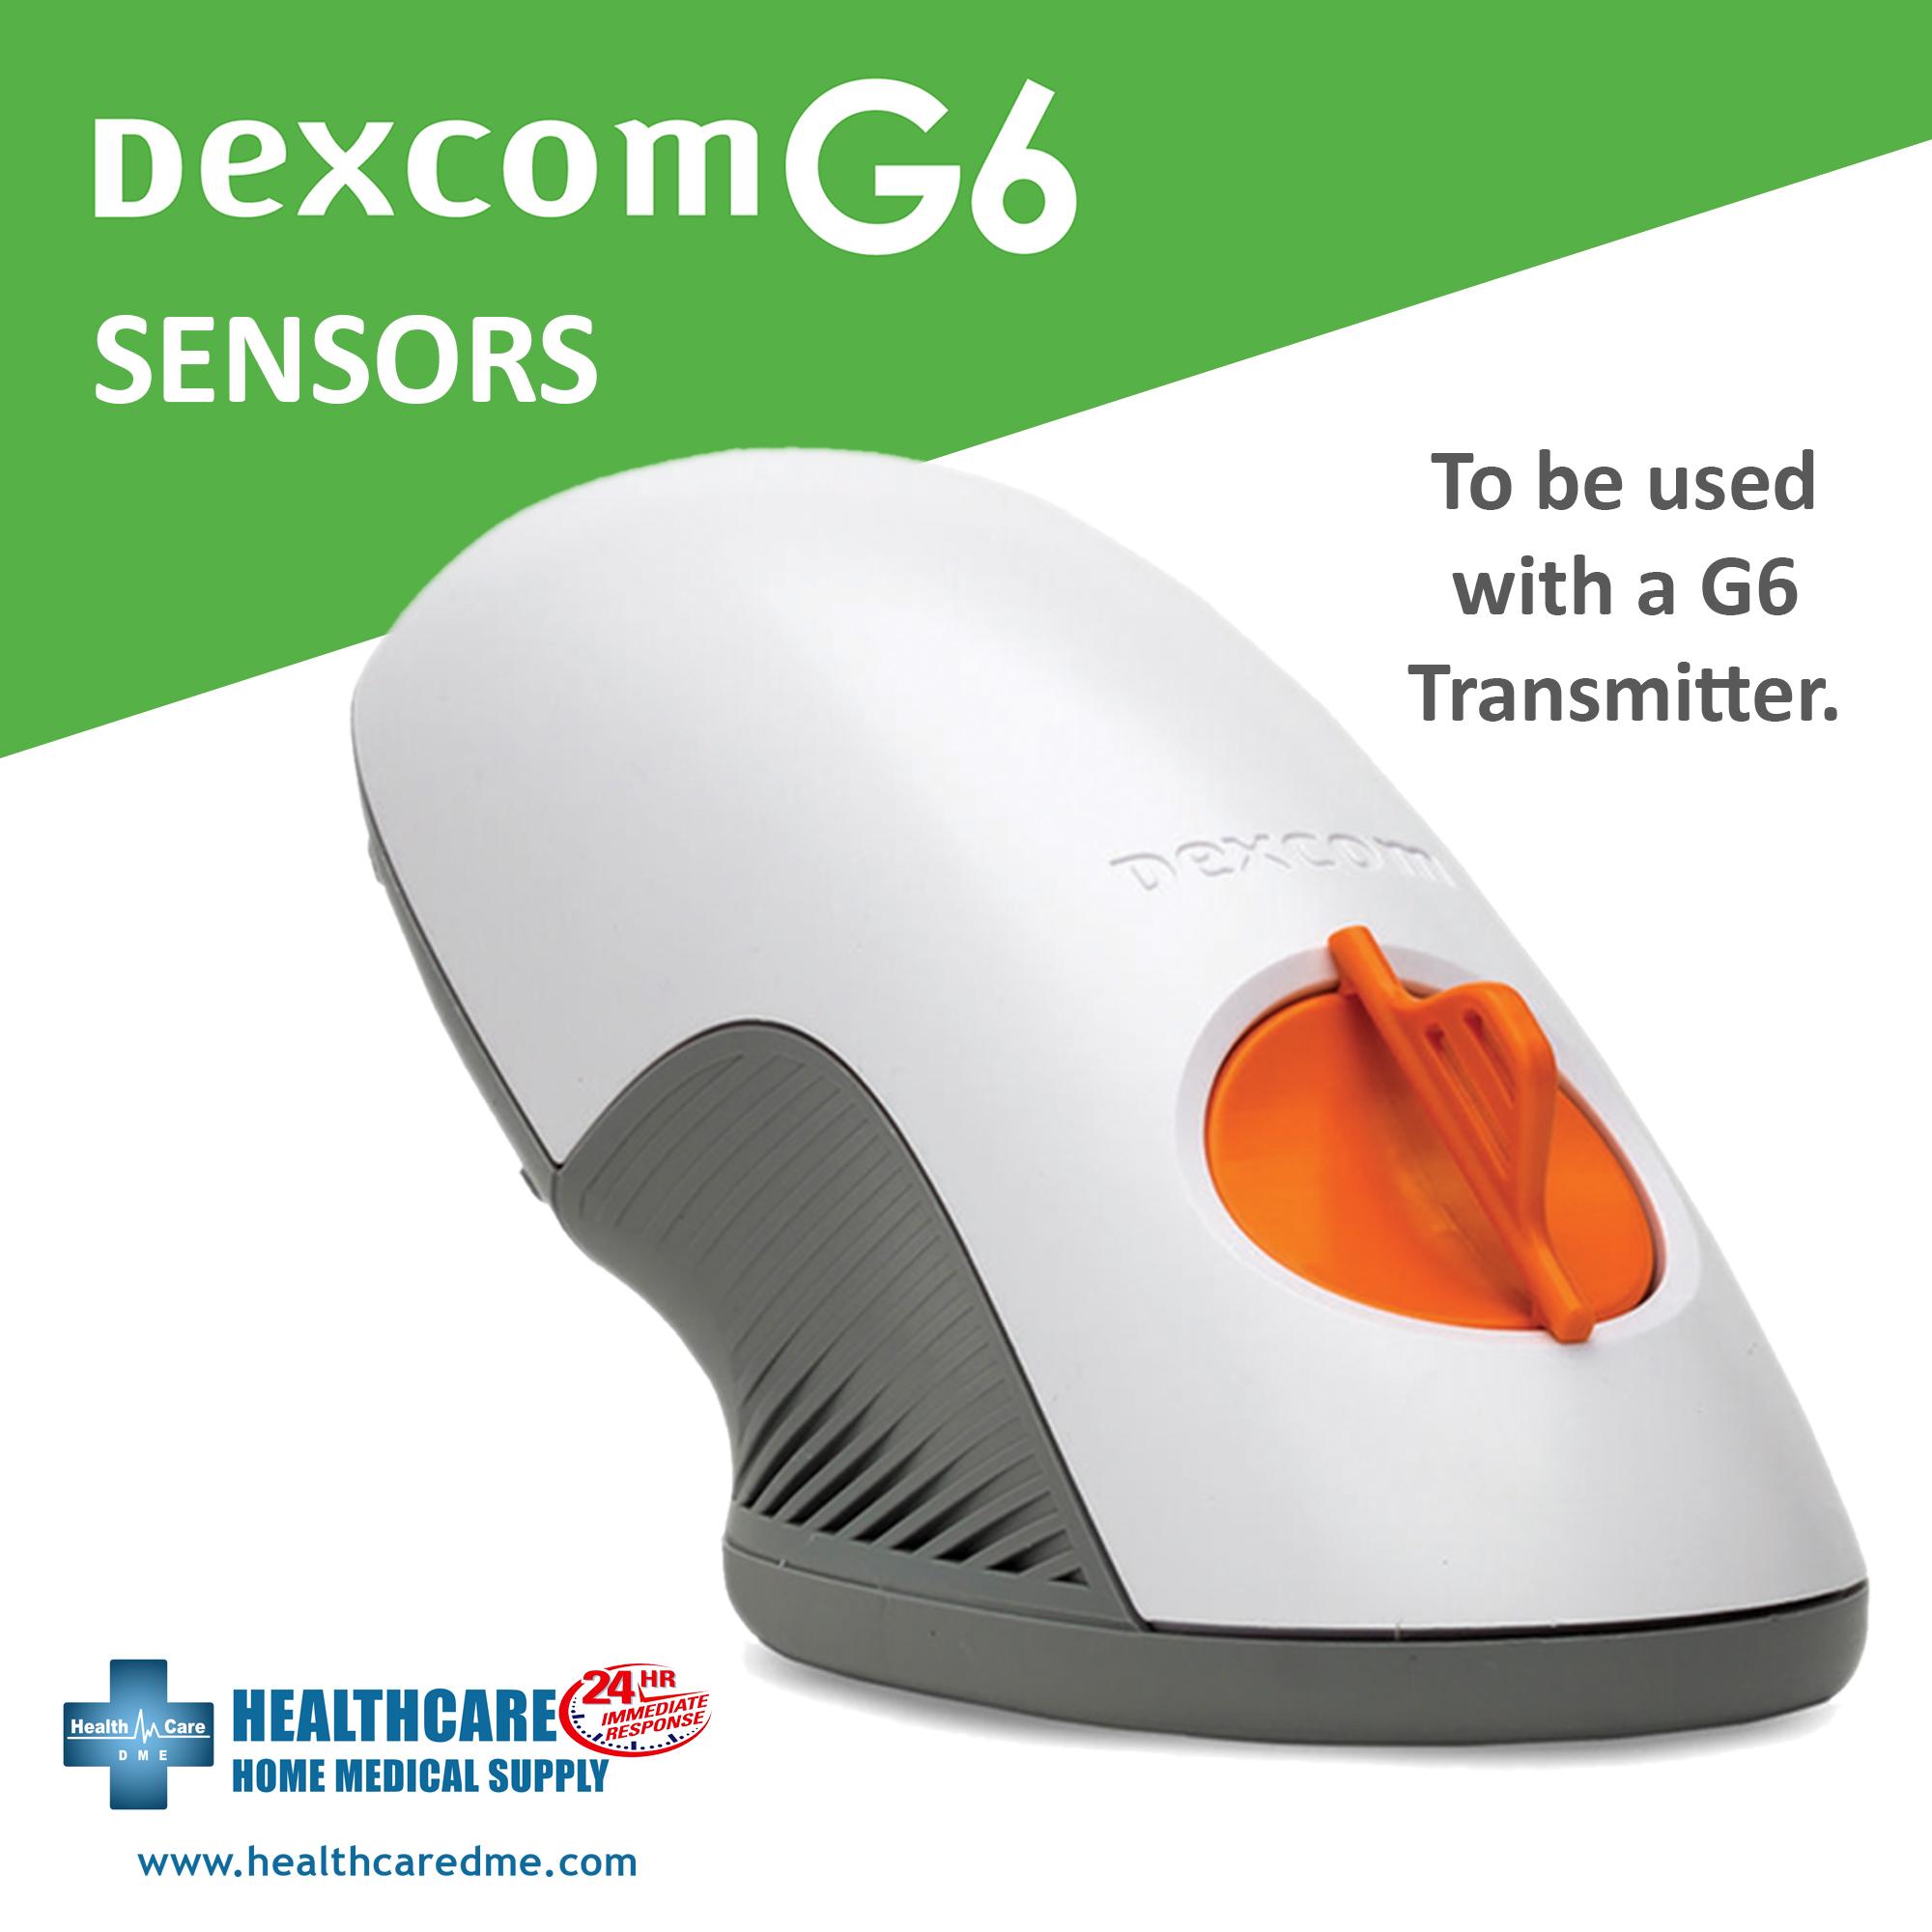 DEXCOM G6 SENSORS | Michigan USA Diabetes Continuous Glucose Monitoring System DEXCOM G6 SENSORS